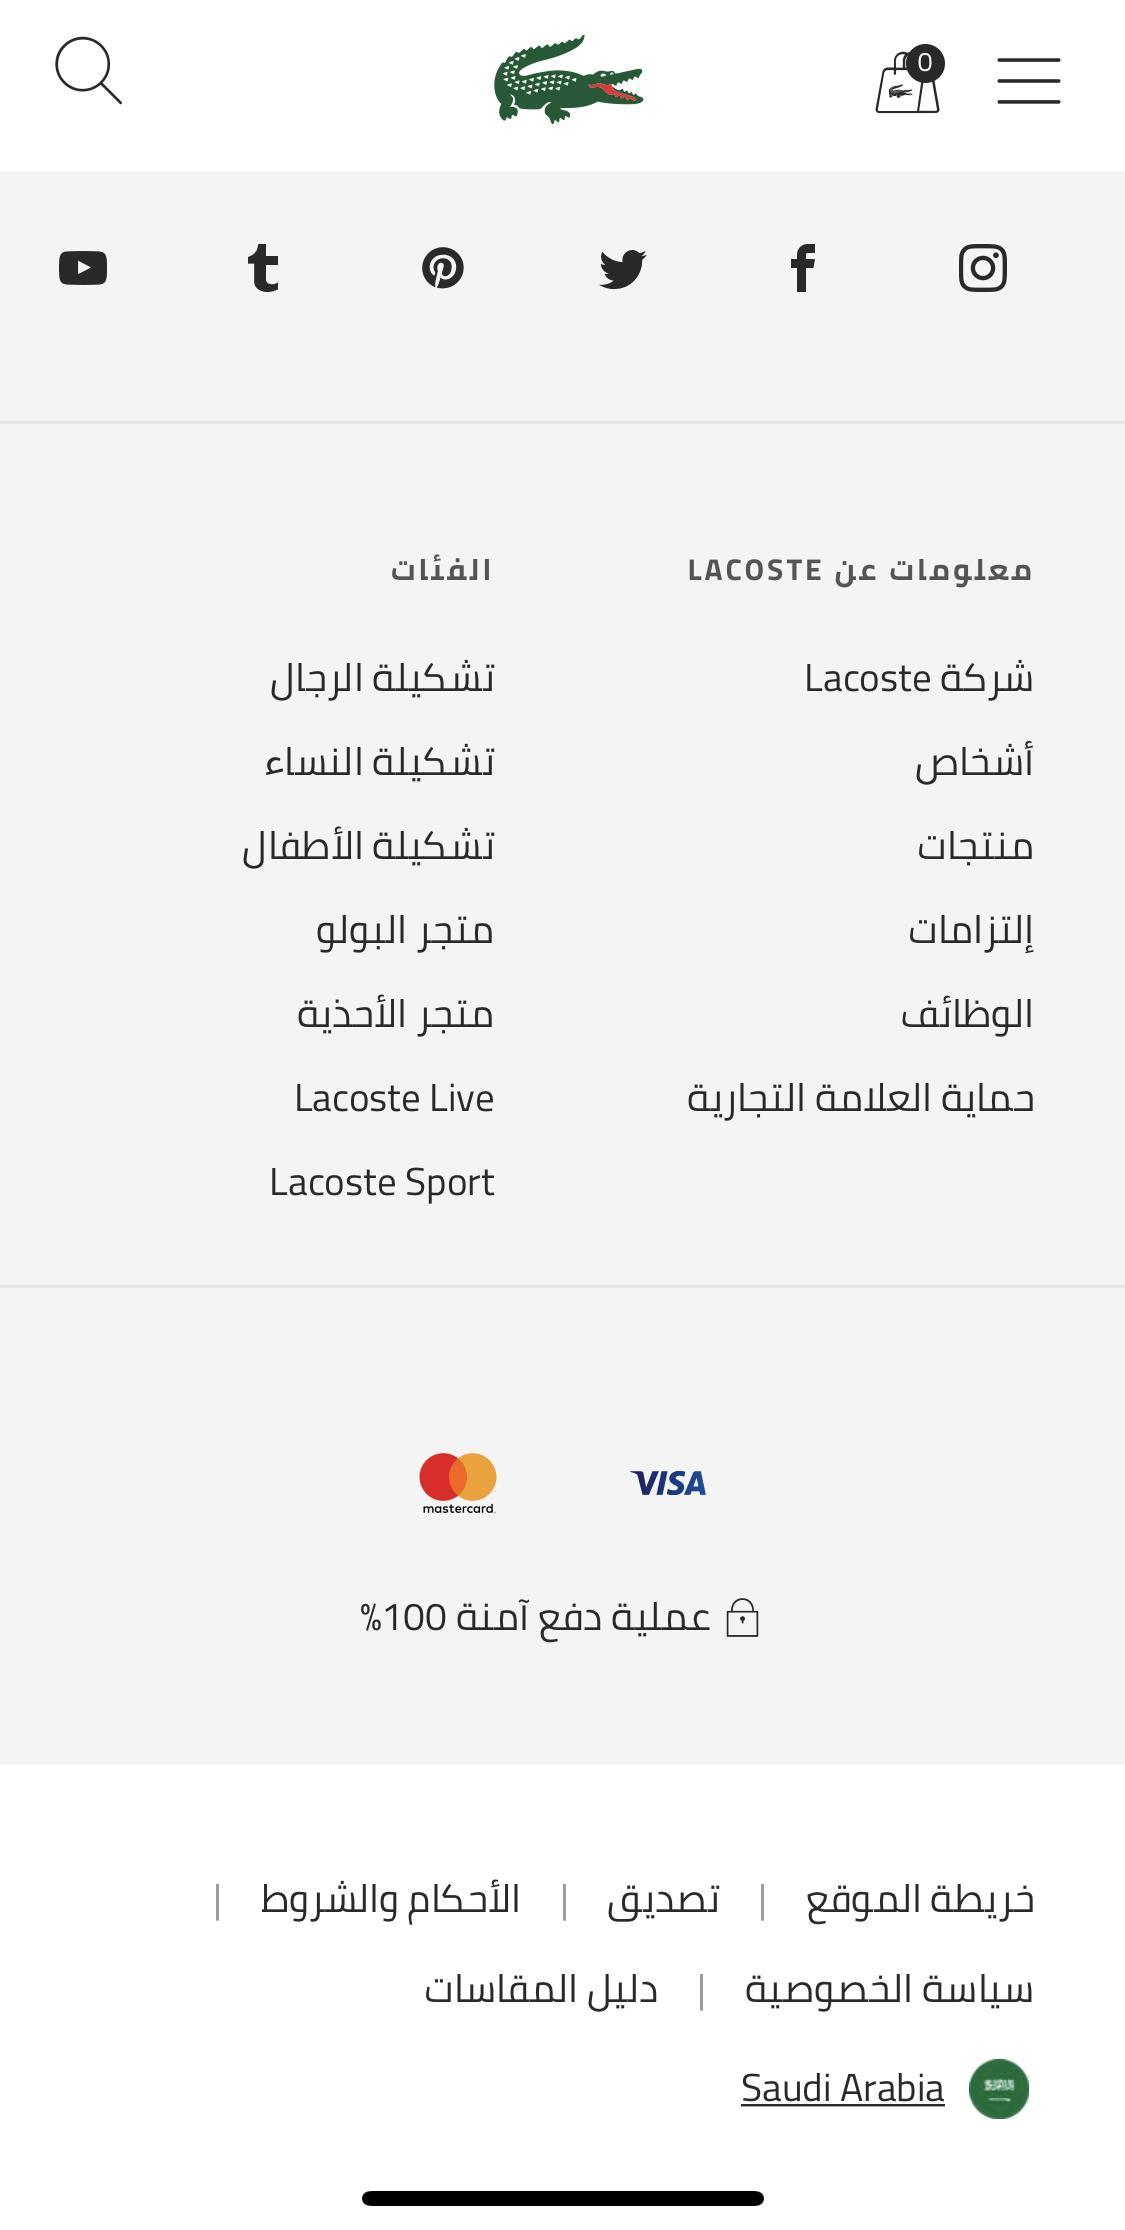 22701549d2461 للمتجر الرسمي لموقع لاكوست الشهير واصبح بالامكان الشراء من داخل السعودية  والامارات وهذا رابط موقع لاكوست السعودي https   www.lacoste .com sa ar homepage